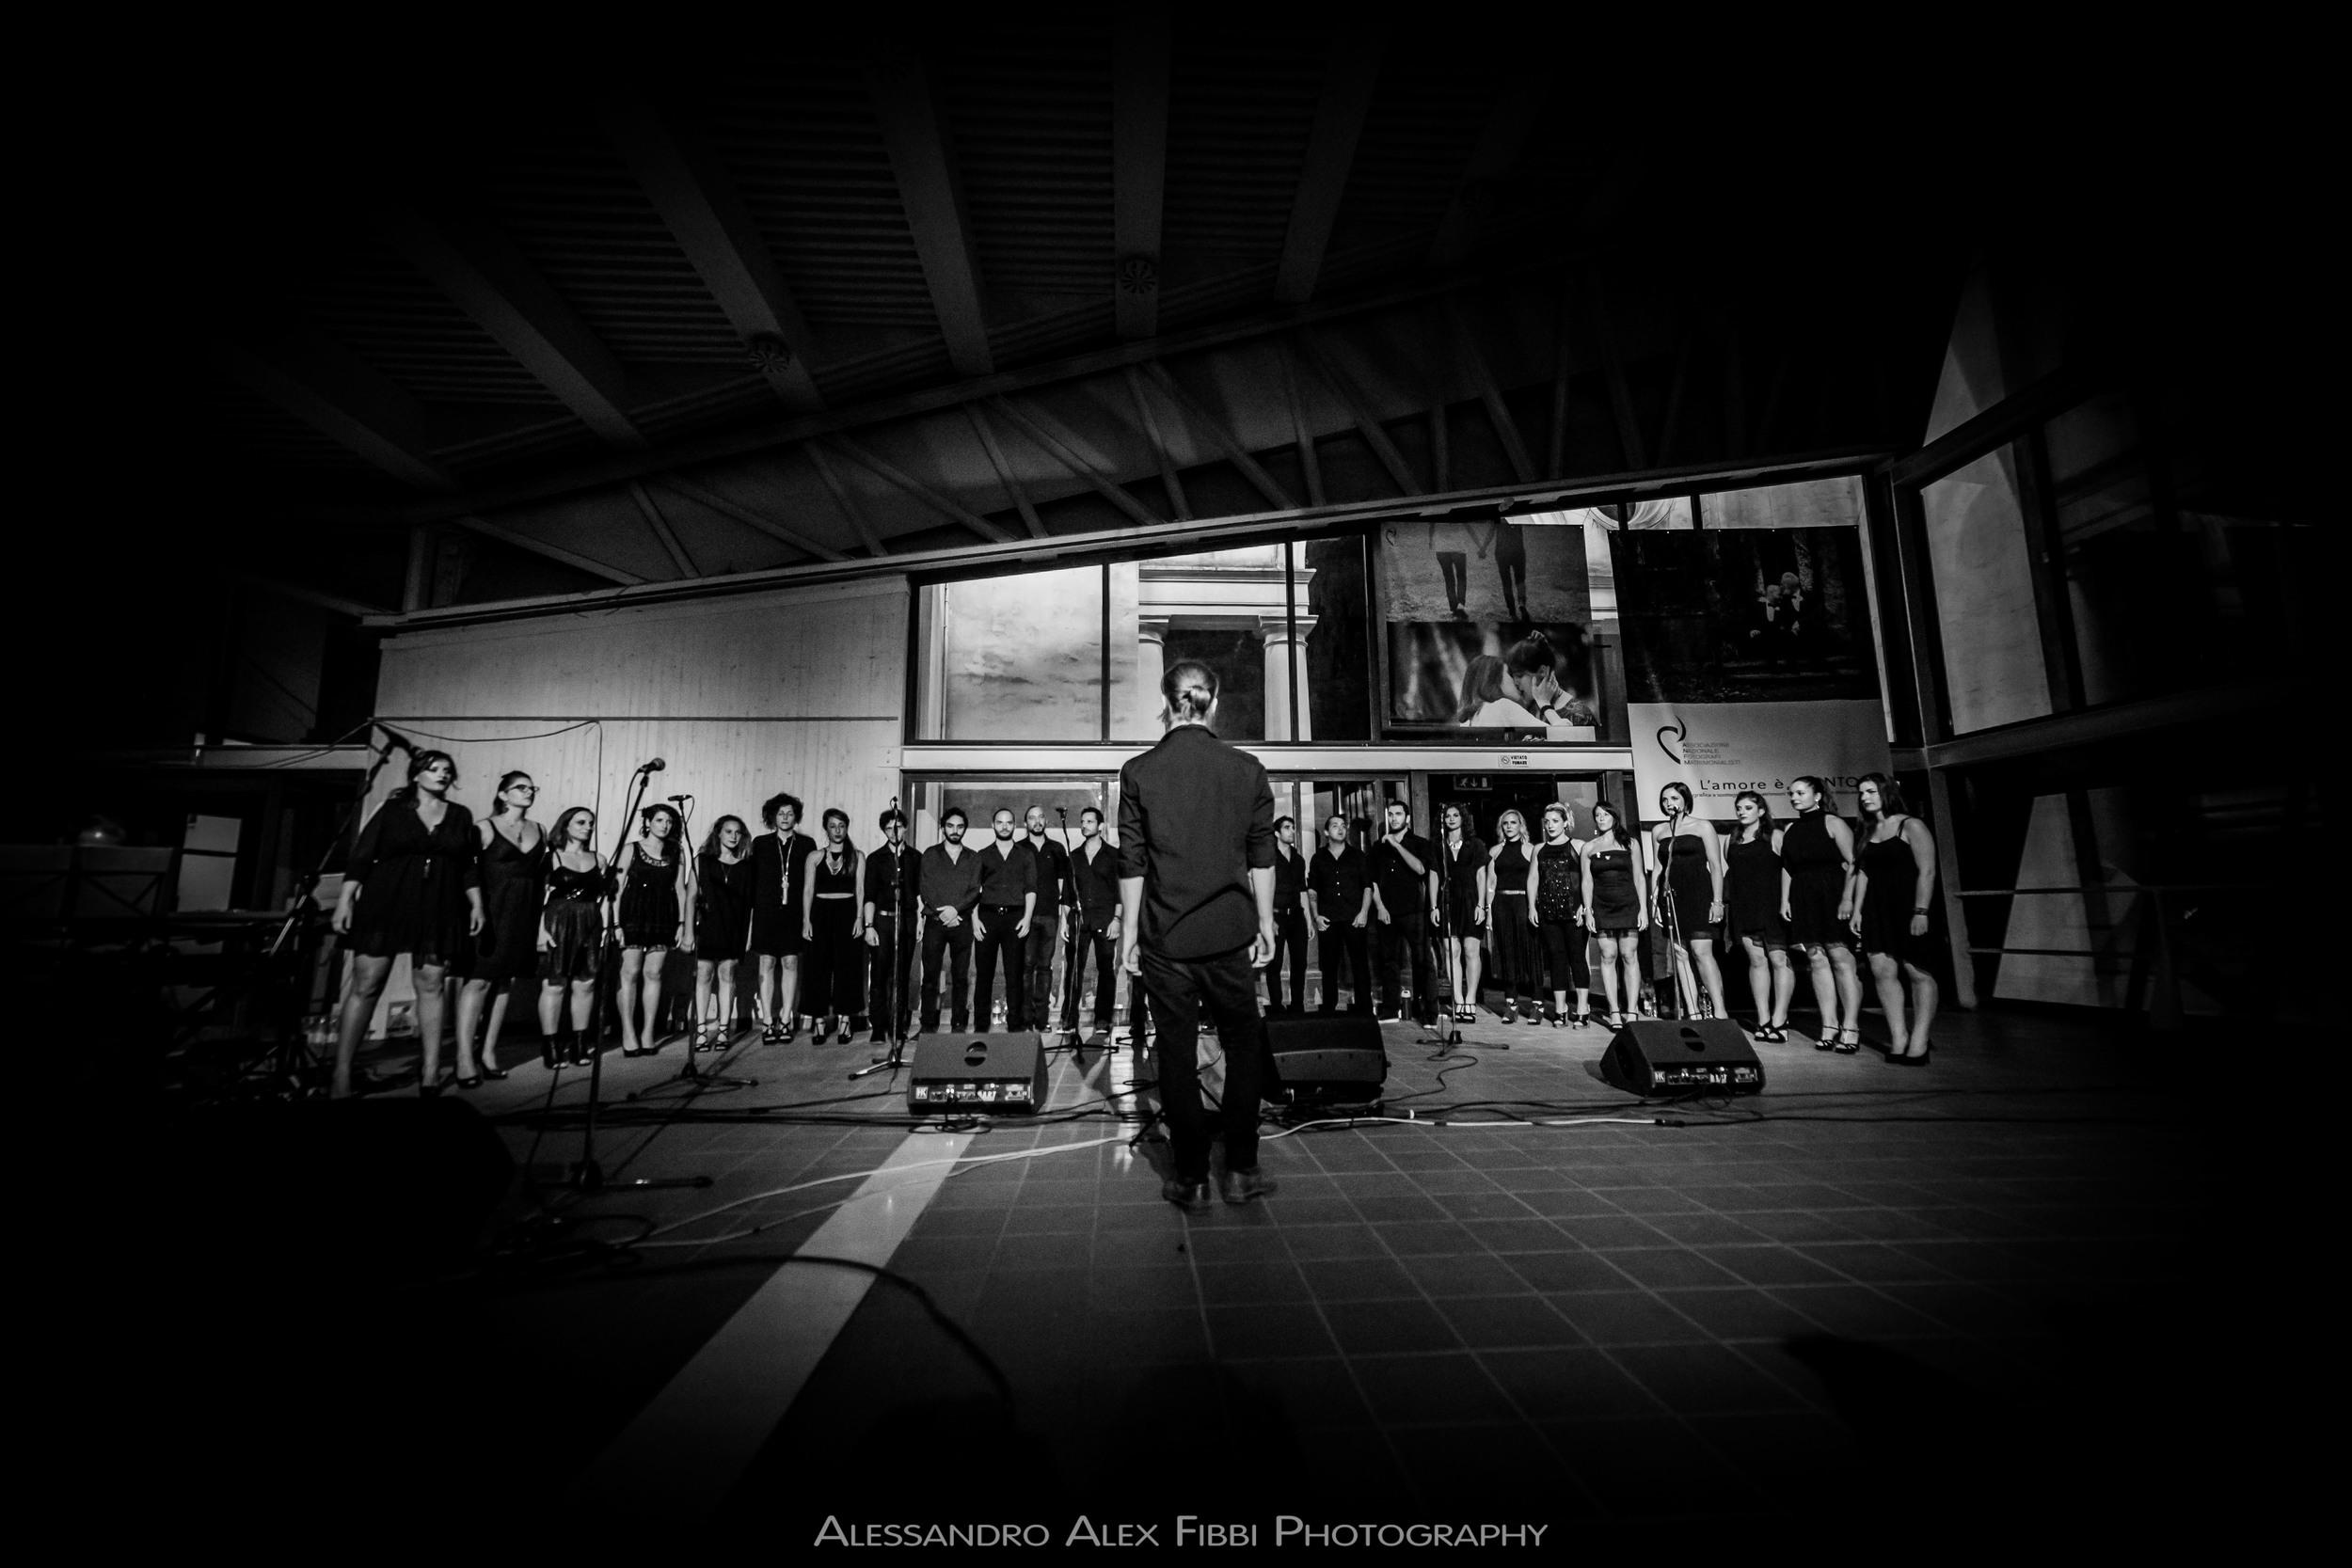 VocalsBlueTrains LIMONAIA 2016 - Alessandro Alex Fibbi Ph-3b.JPG